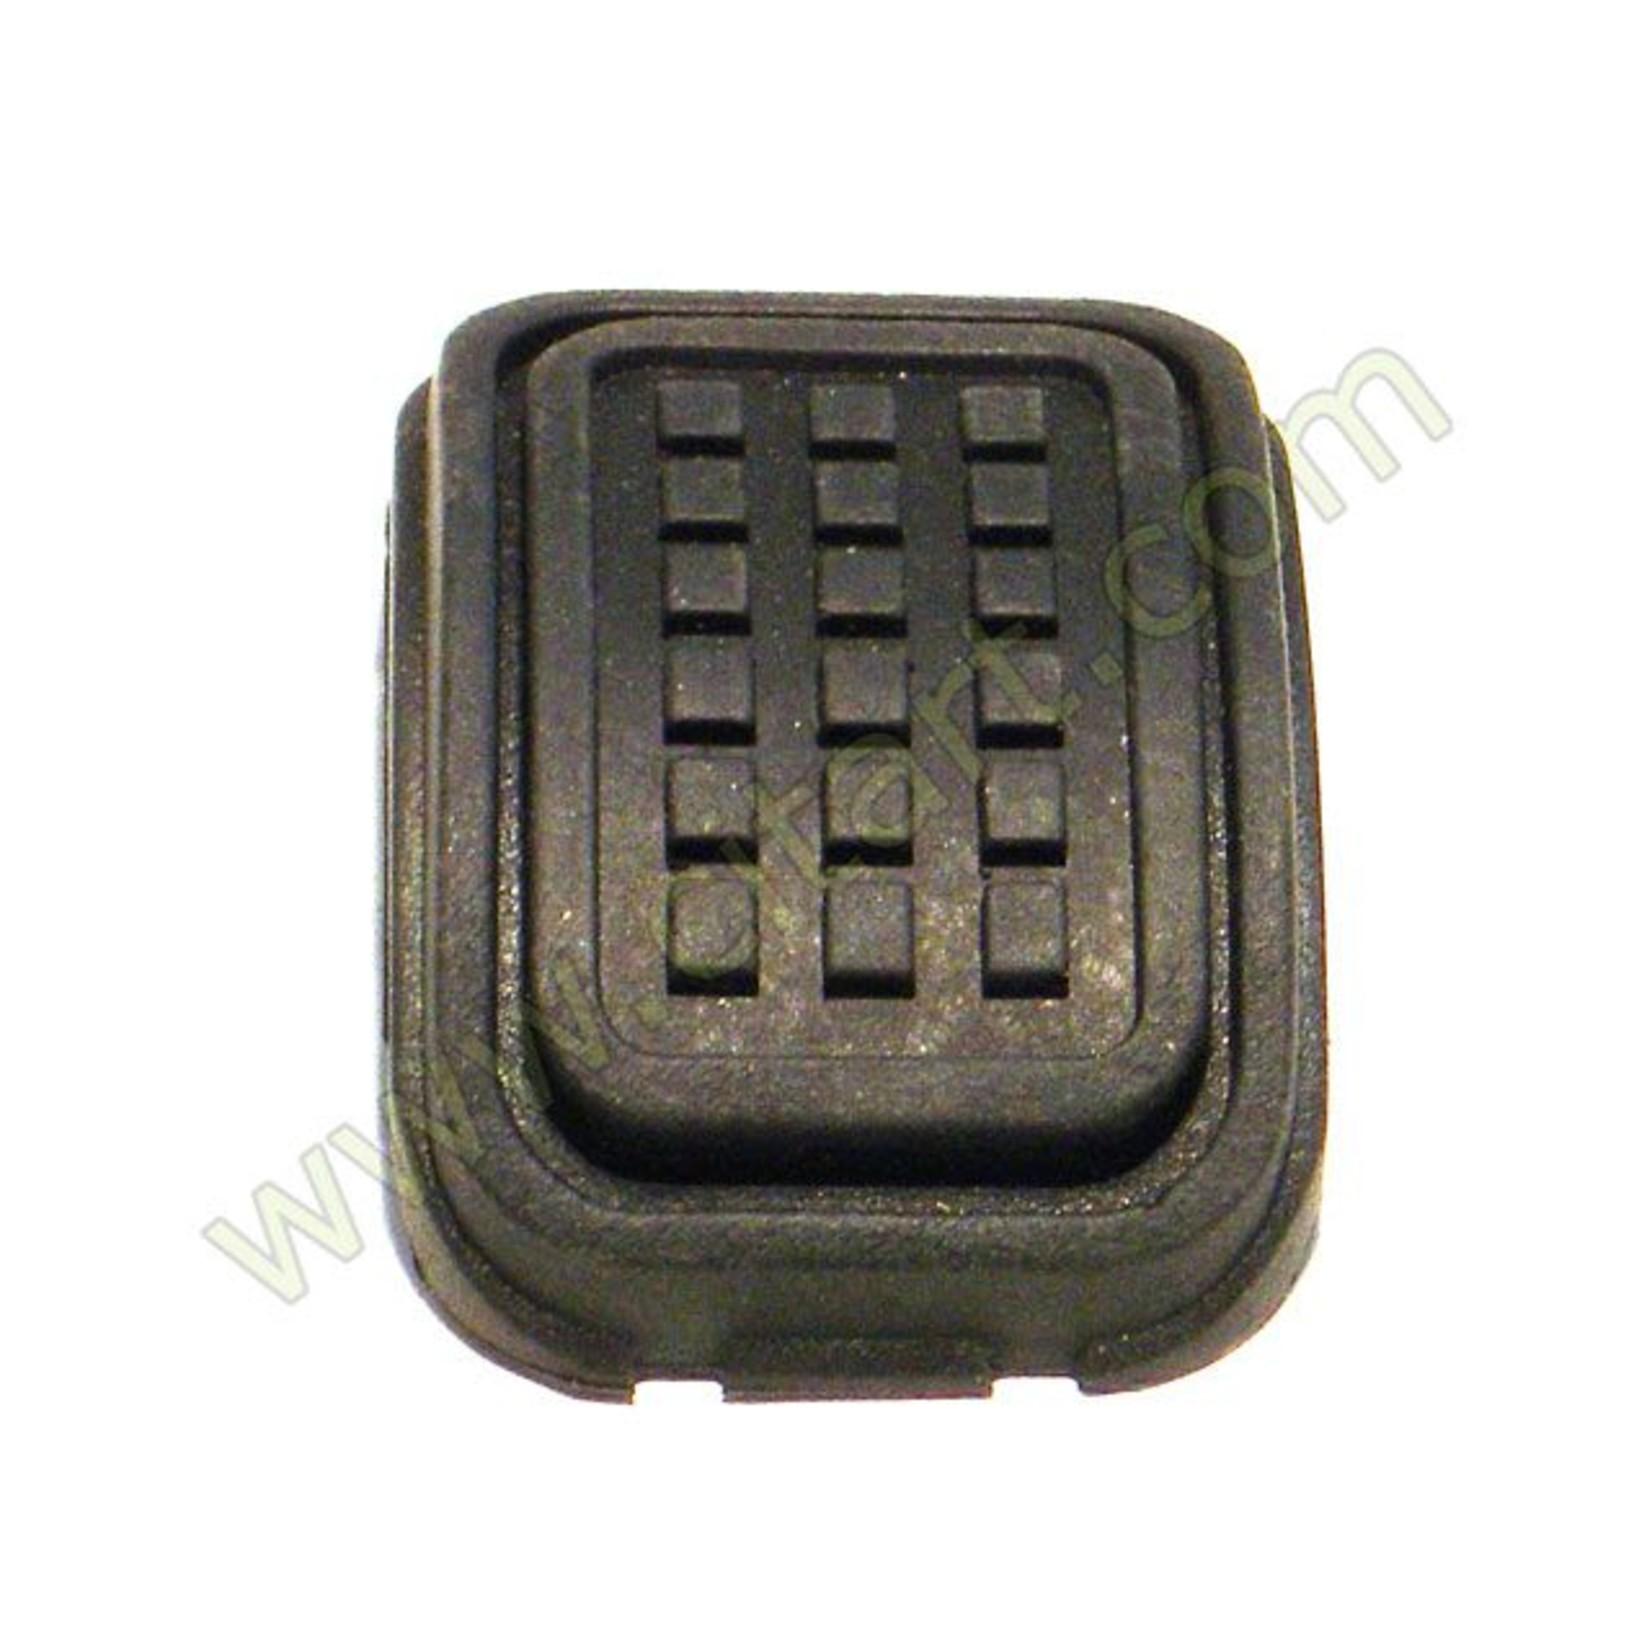 Rubber pad parking brake pallas Nr Org: 5420552